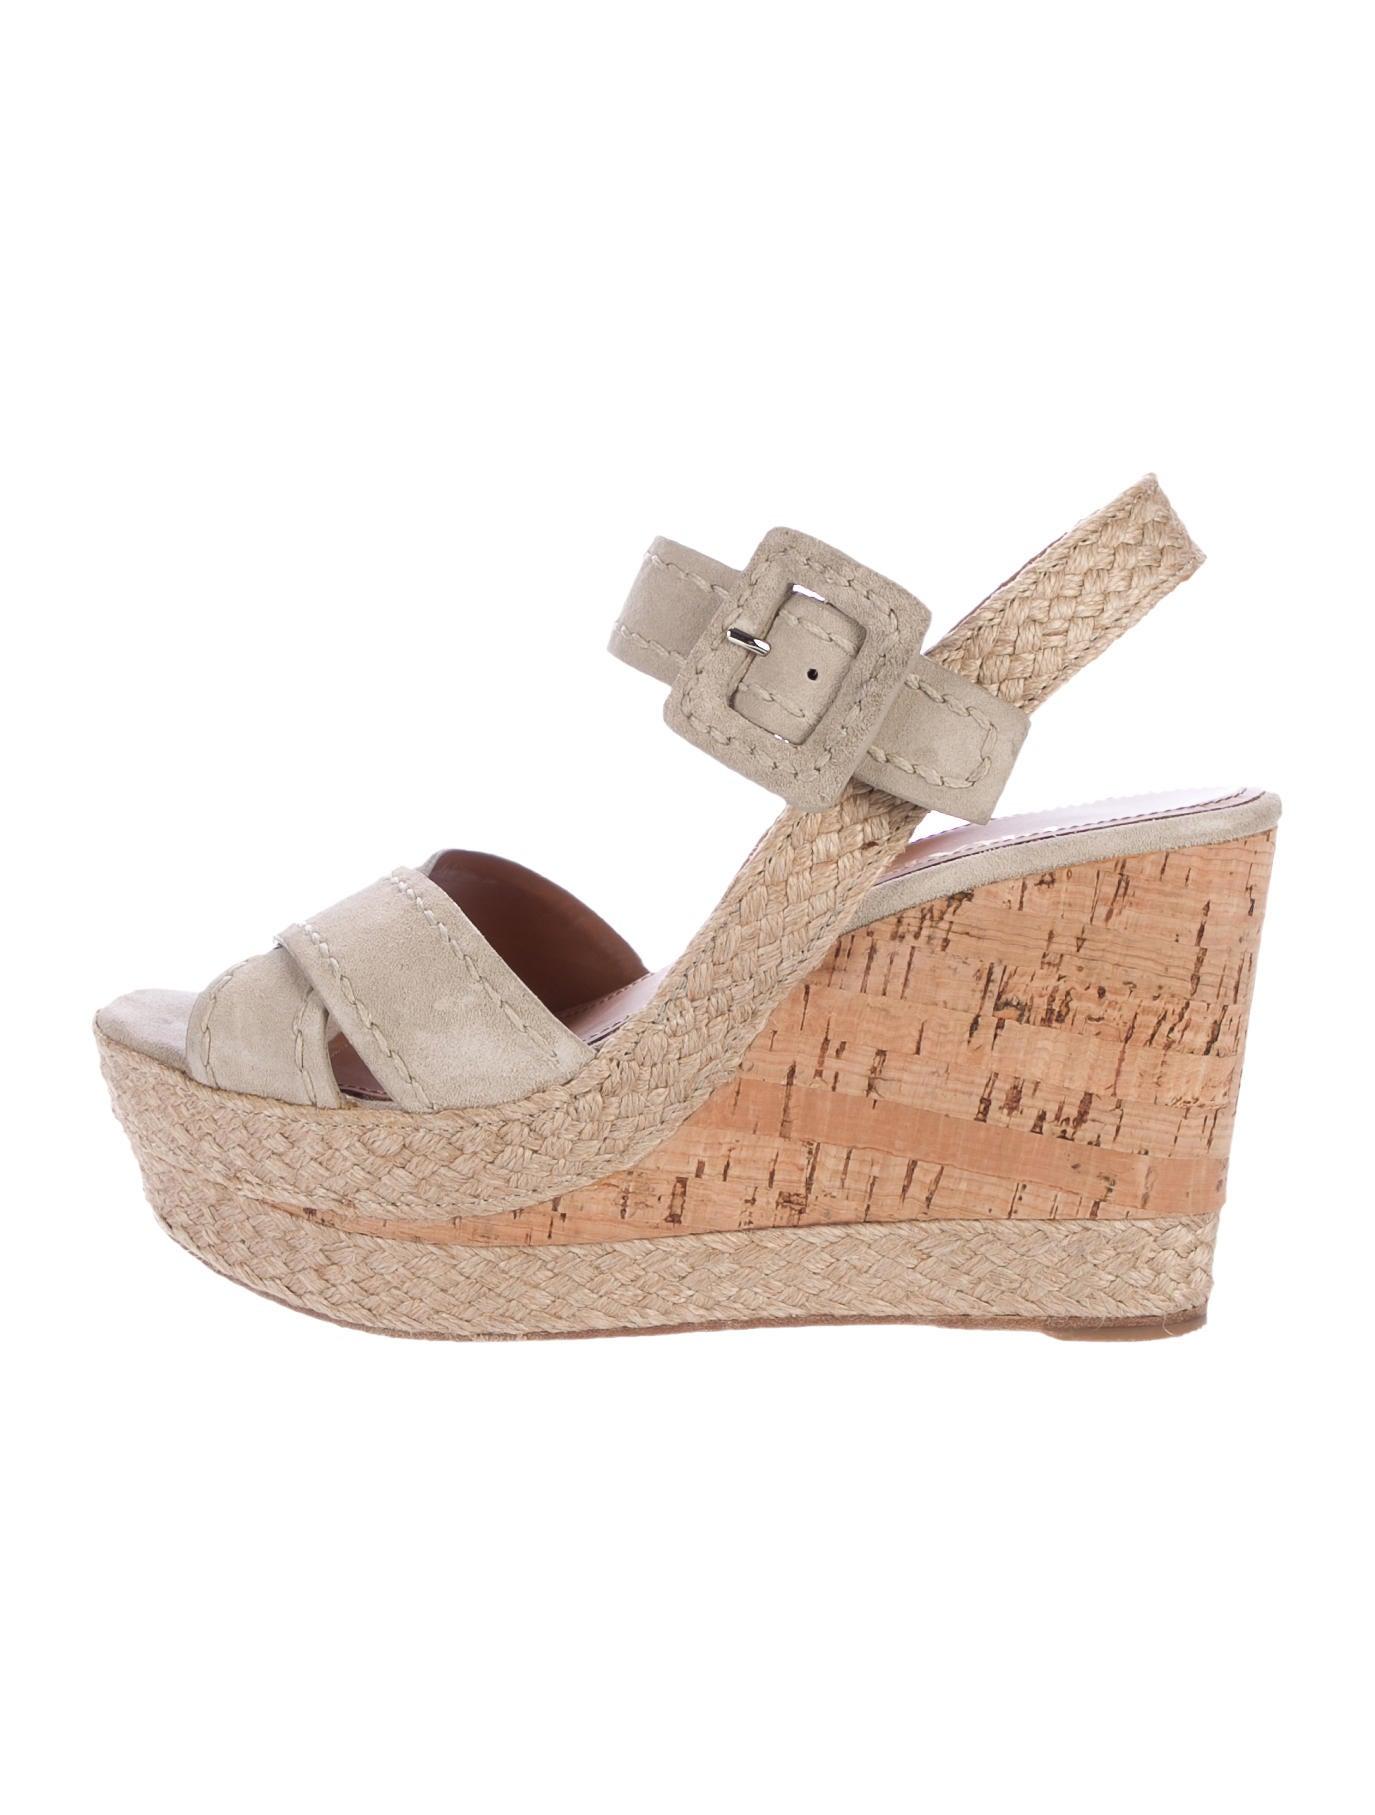 prada suede cork wedge sandals shoes pra170550 the